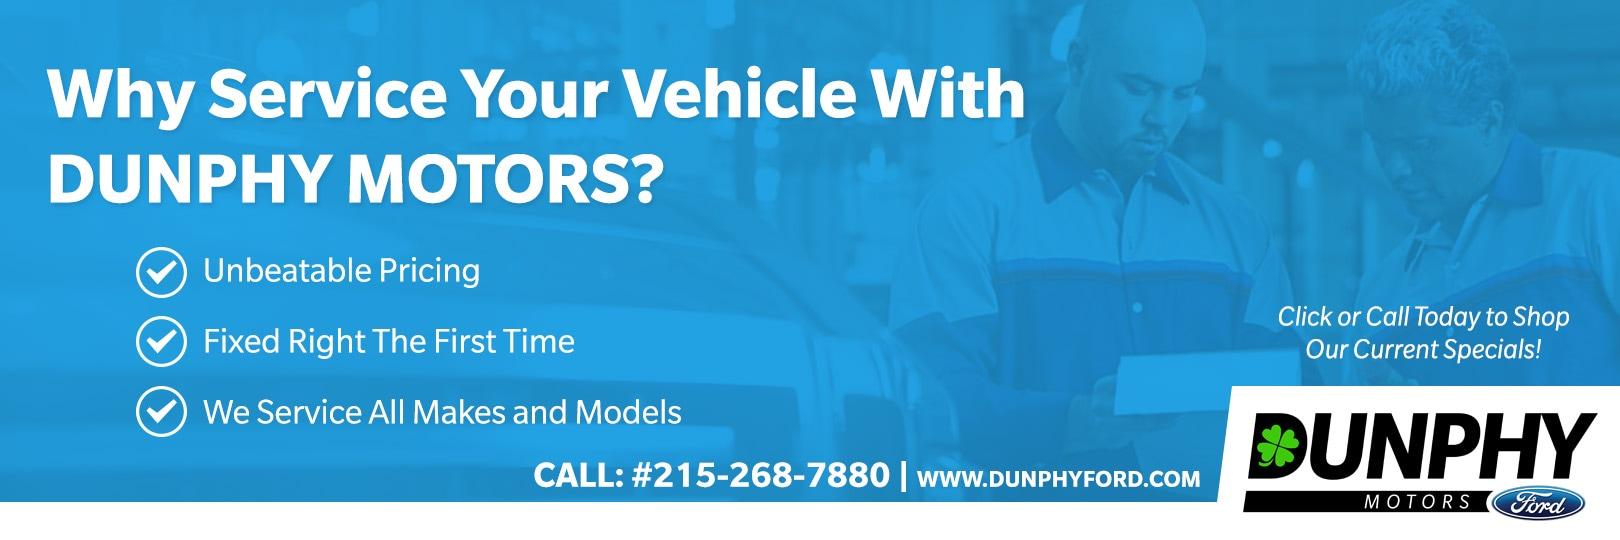 Dunphy Service Center